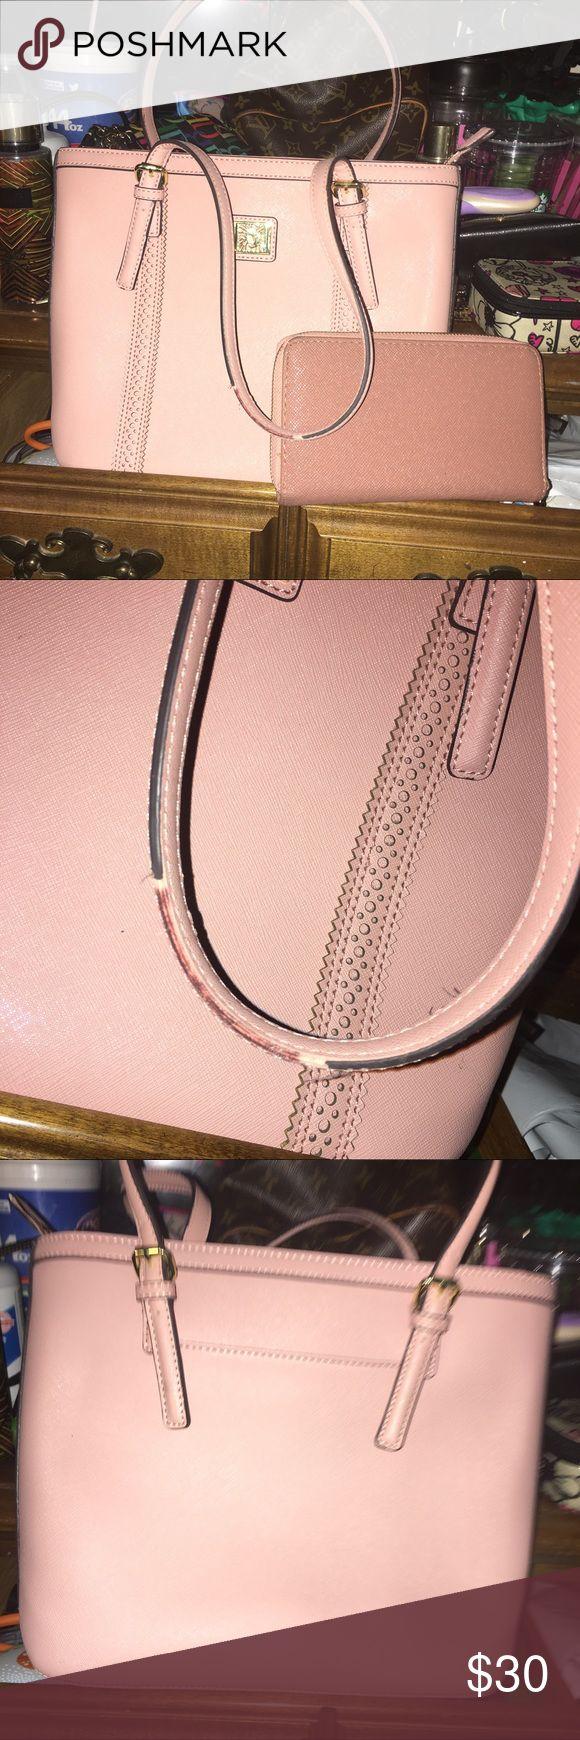 anne klein handbag set wallet is no name brand but is included anne klein handbag no rips small handles shows some peeling nothing major Anne Klein Bags Shoulder Bags